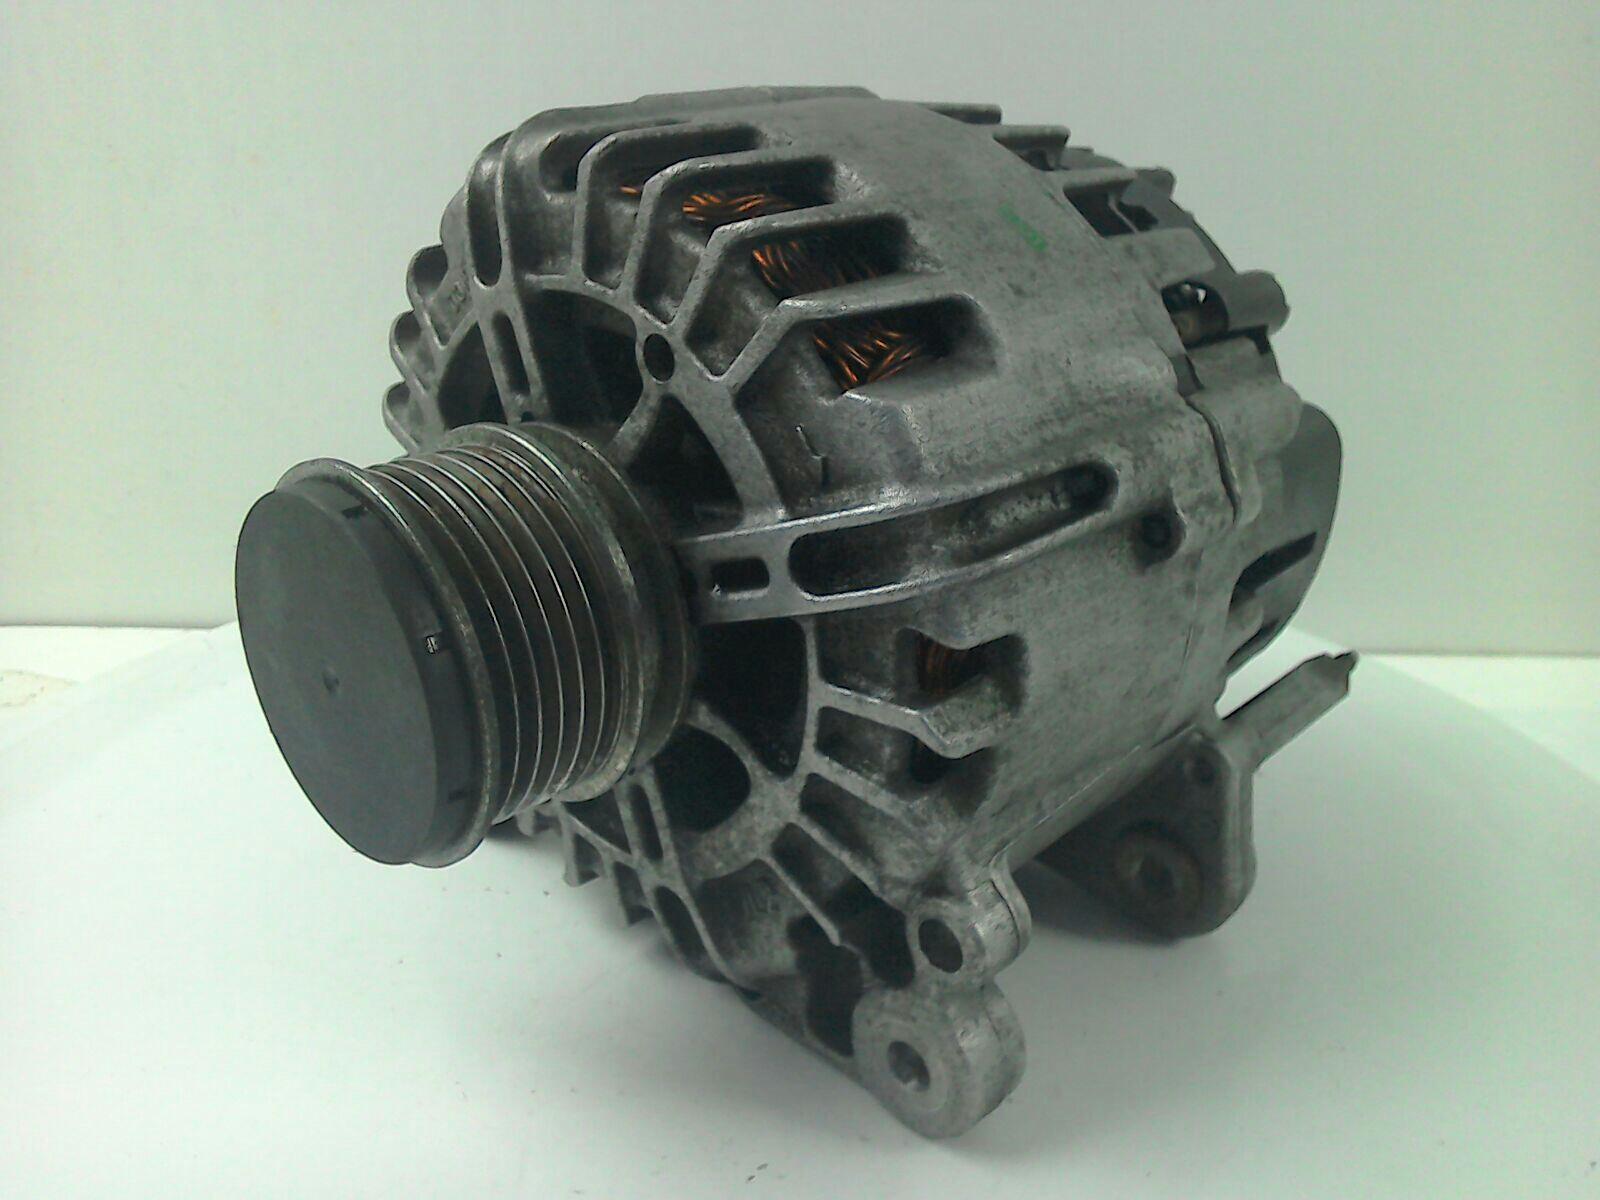 audi a3 2008 to 2013 alternator diesel manual for sale from scb rh scbvehicledismantlers co uk Audi A3 Sportback Audi A3 TDI